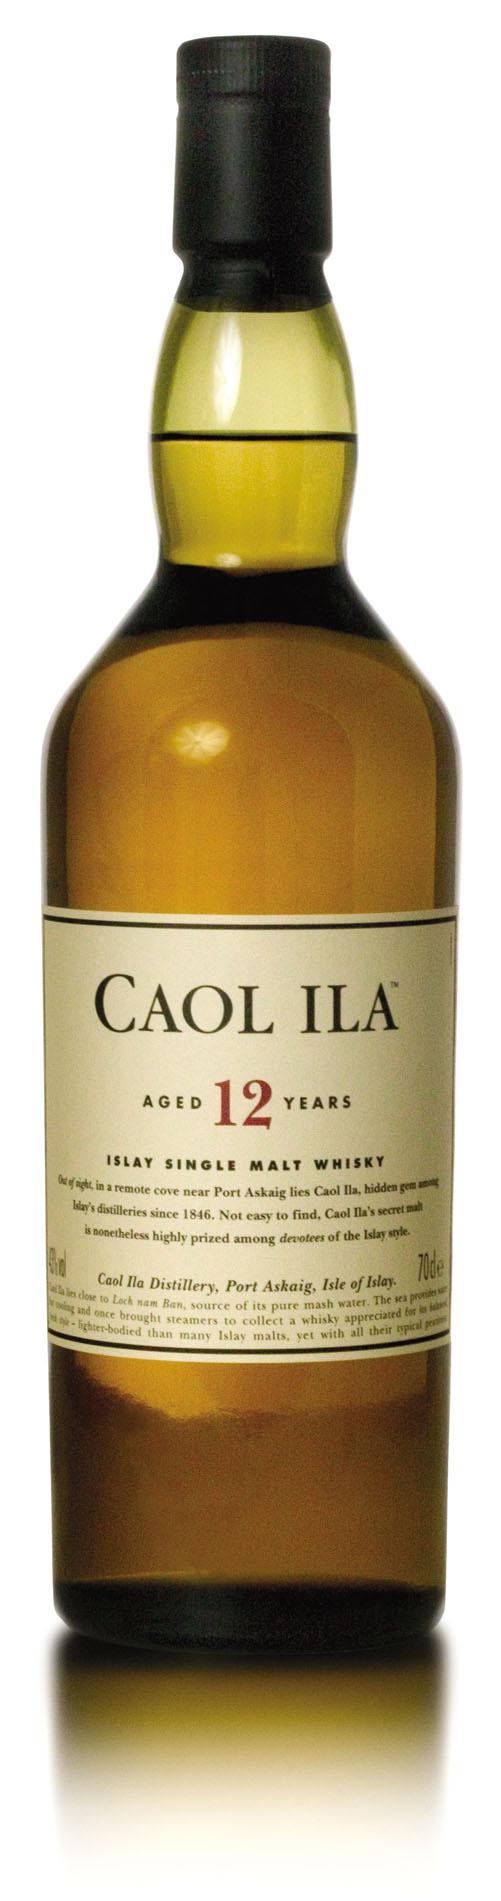 Caol ila Bottle 12yrs low-res